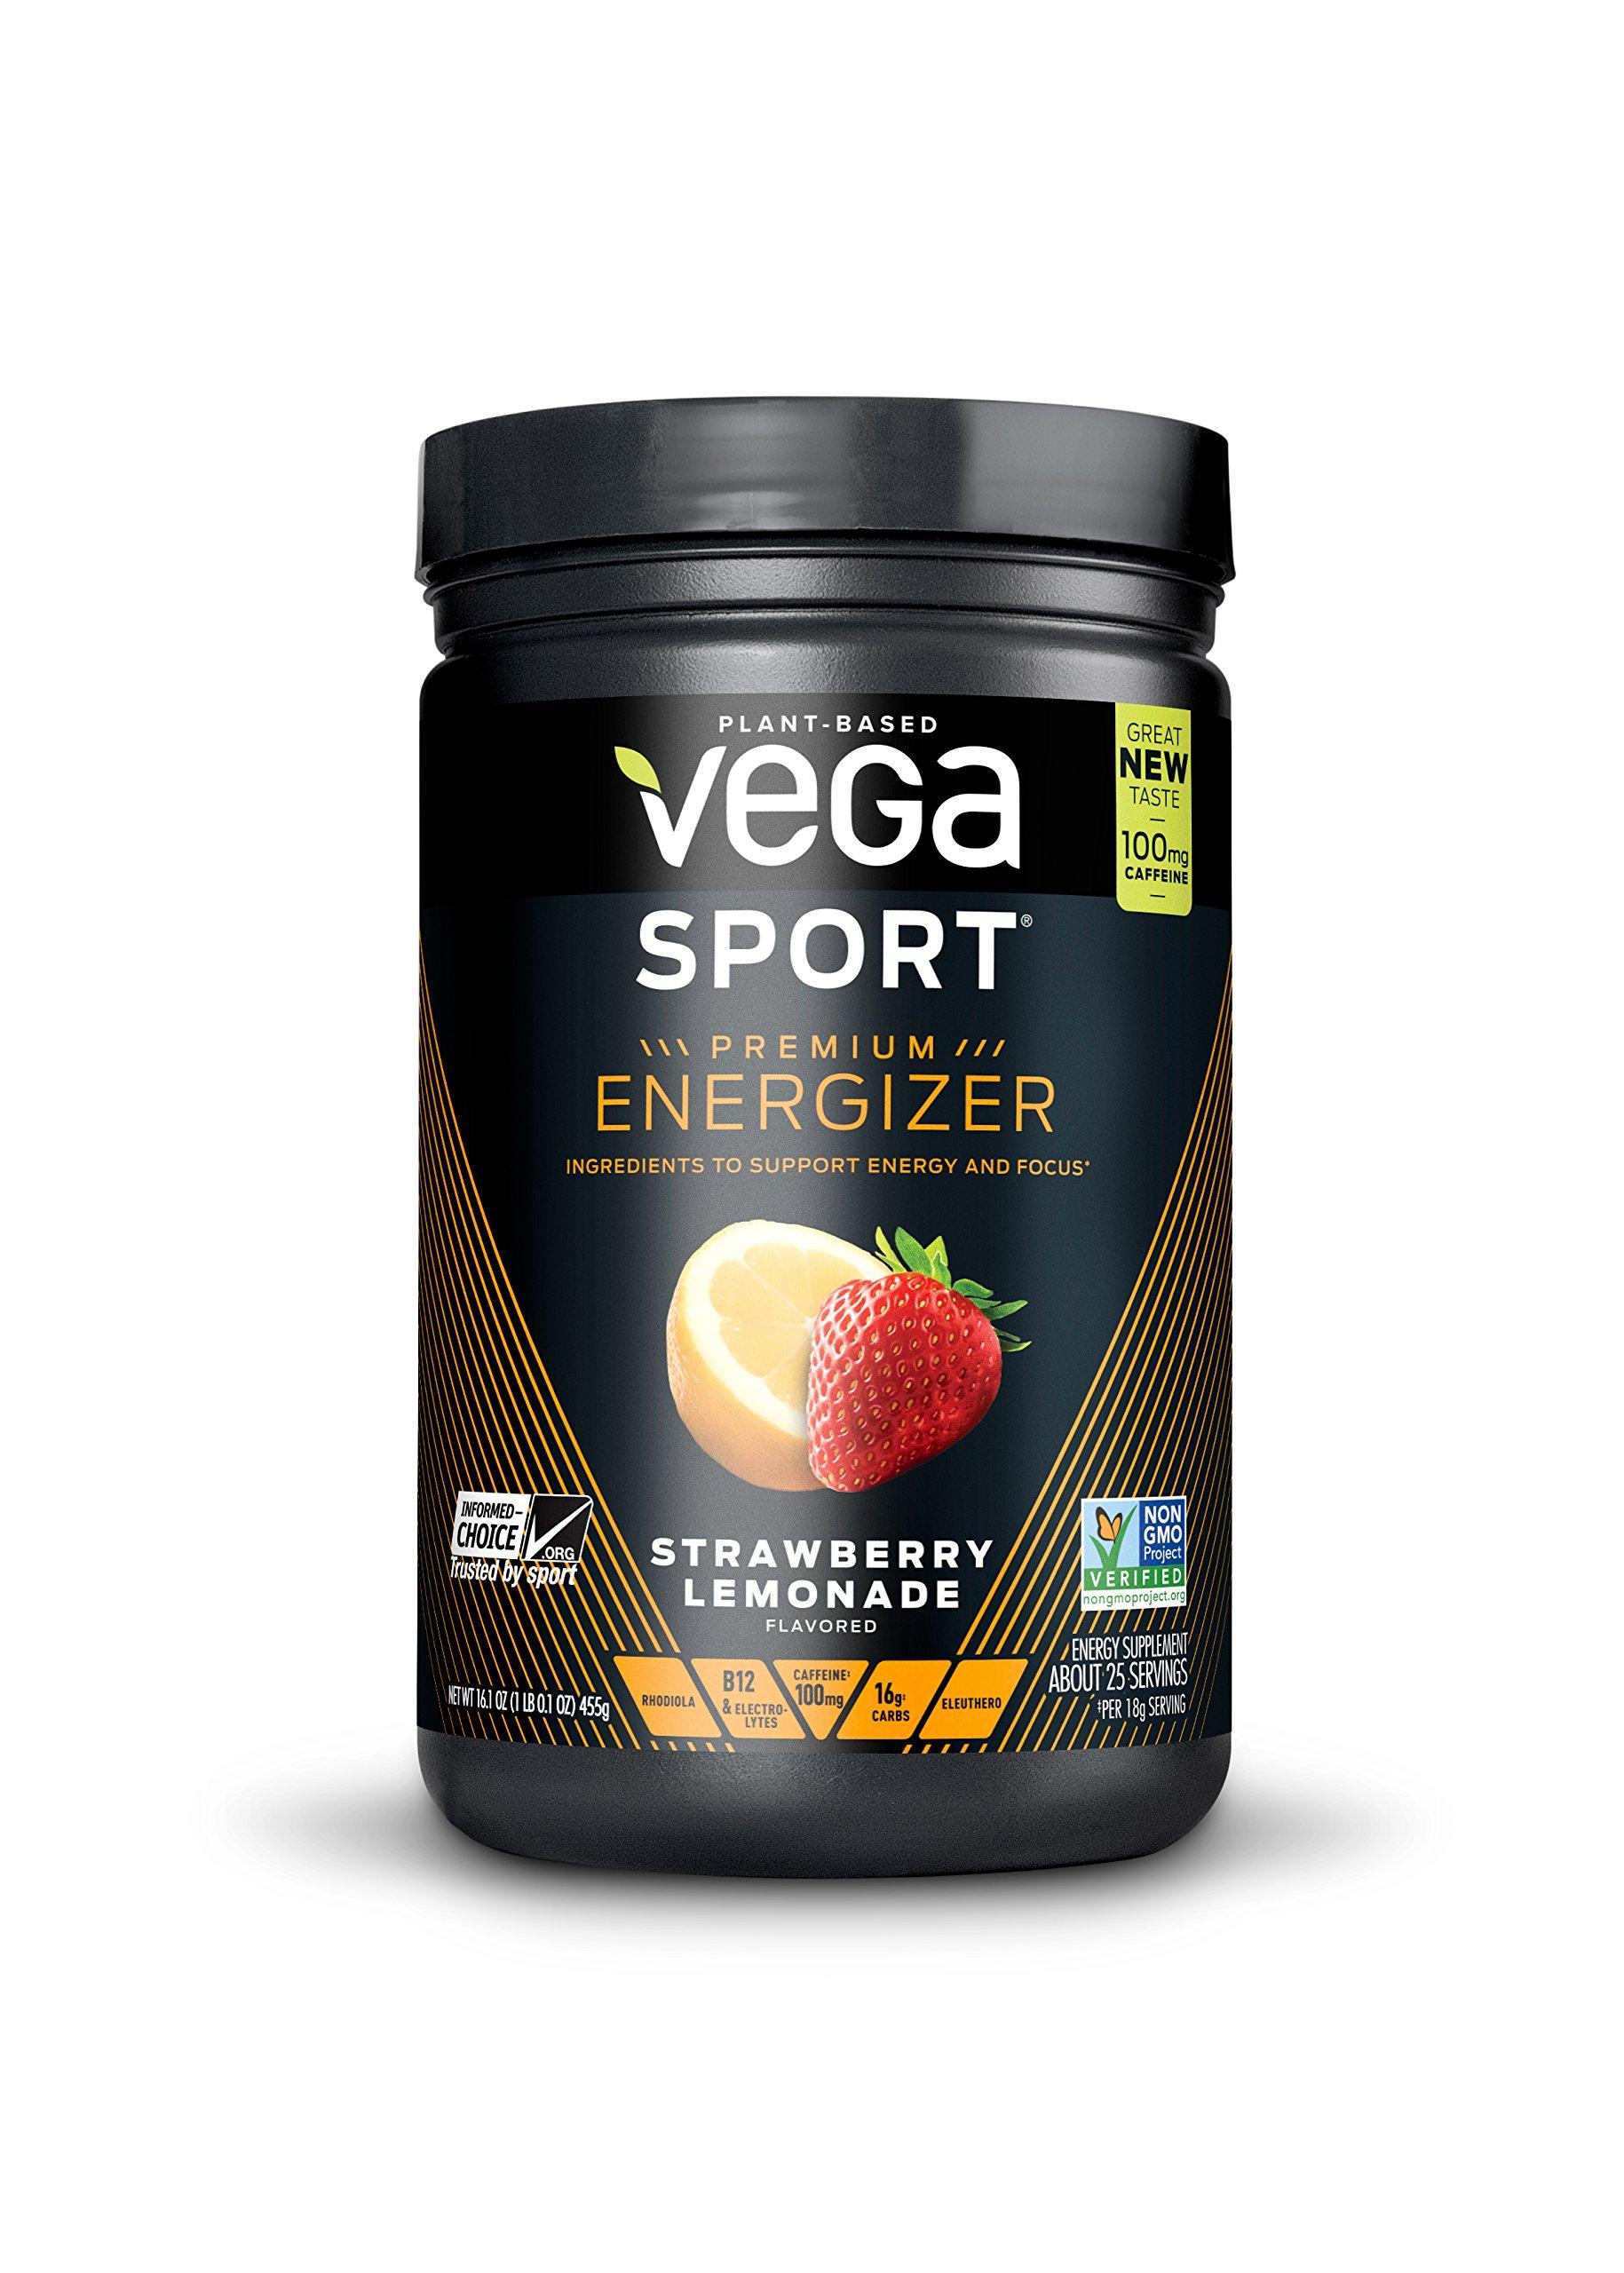 New Vega Sport Premium Energizer Strawberry Lemonade (25 Servings, 16.1 oz) - Vegan,  Gluten Free, All Natural, Pre Workout Powder, Non GMO